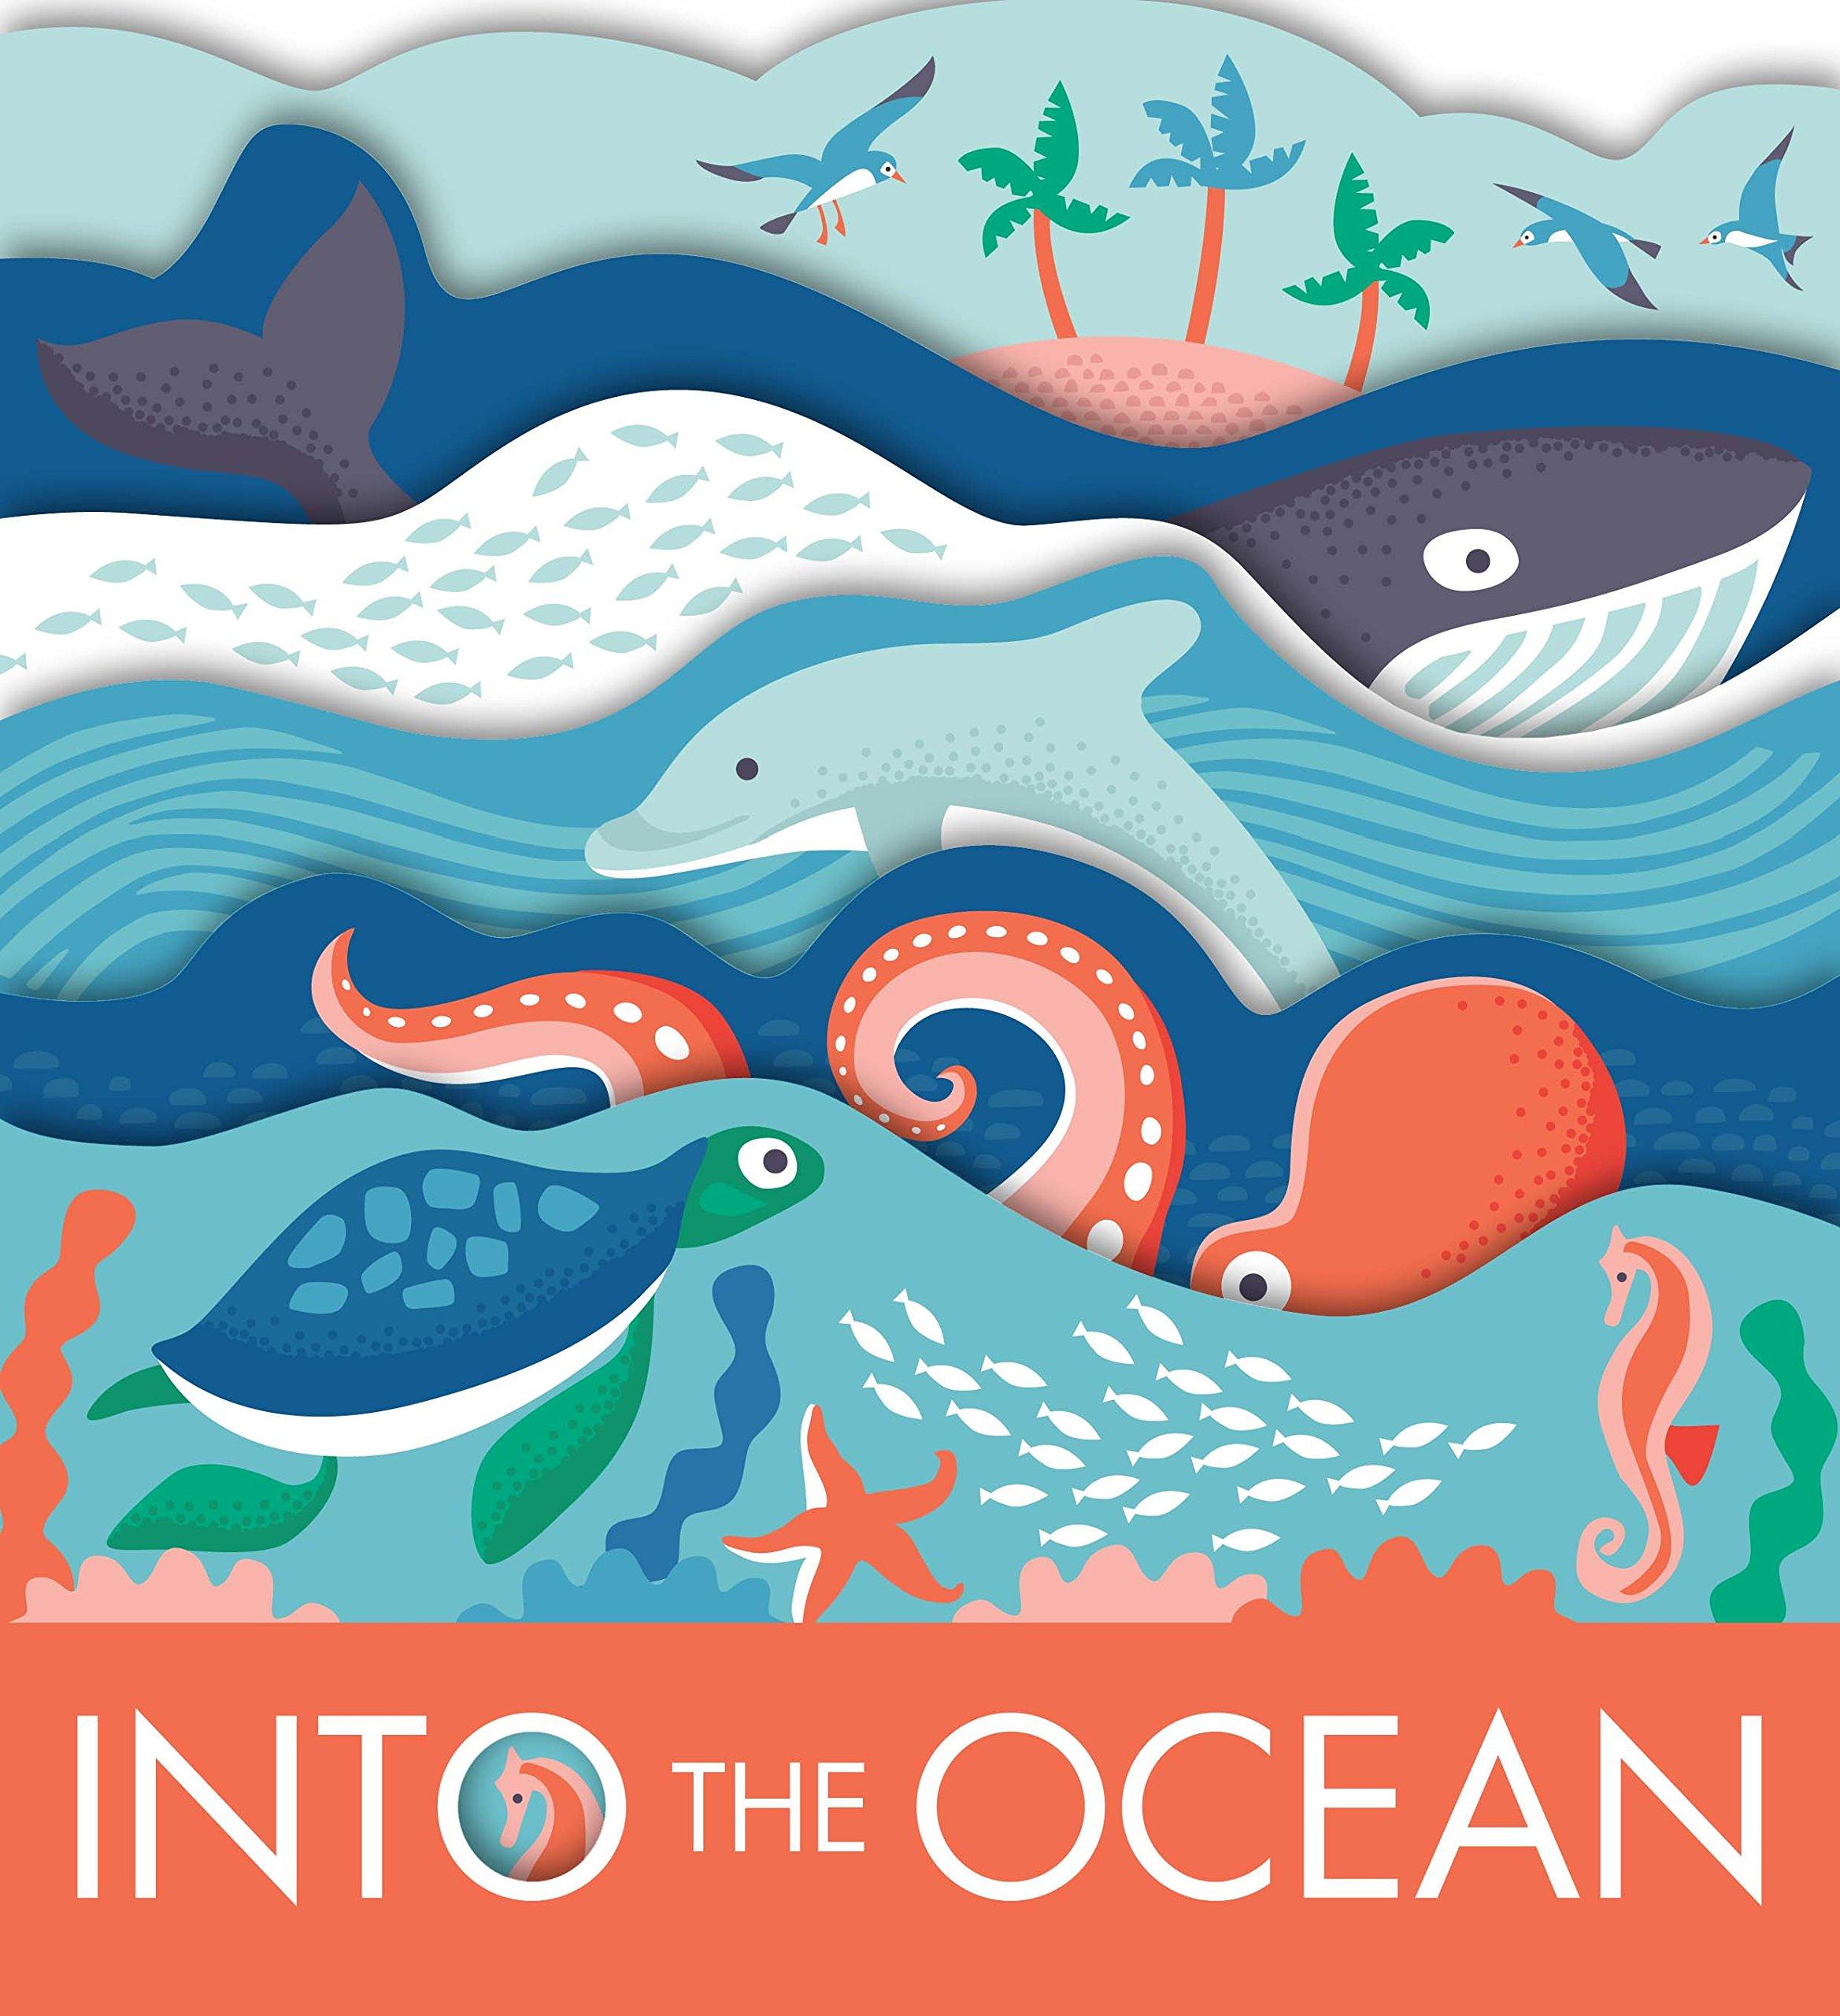 board book, preschool, children's book writer, author, wipe clean, numbers